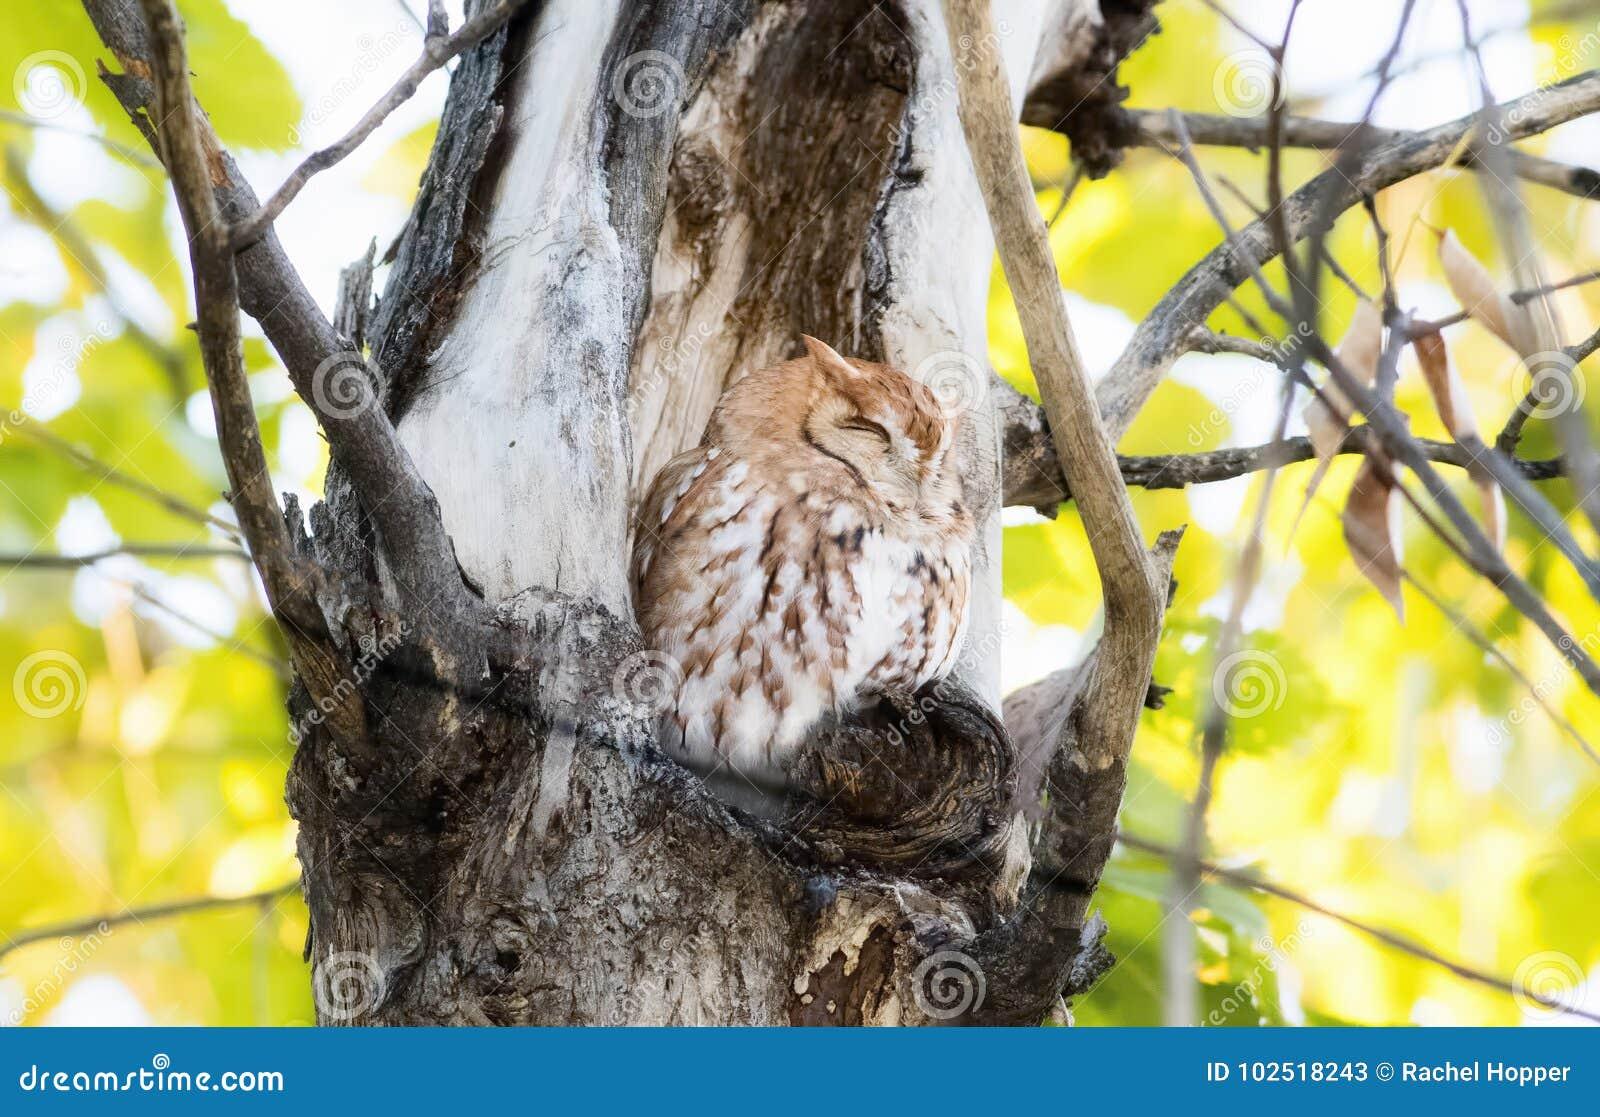 Ostrot verwandeln Schrei-Eule Megascops-Asio in Ash Tree